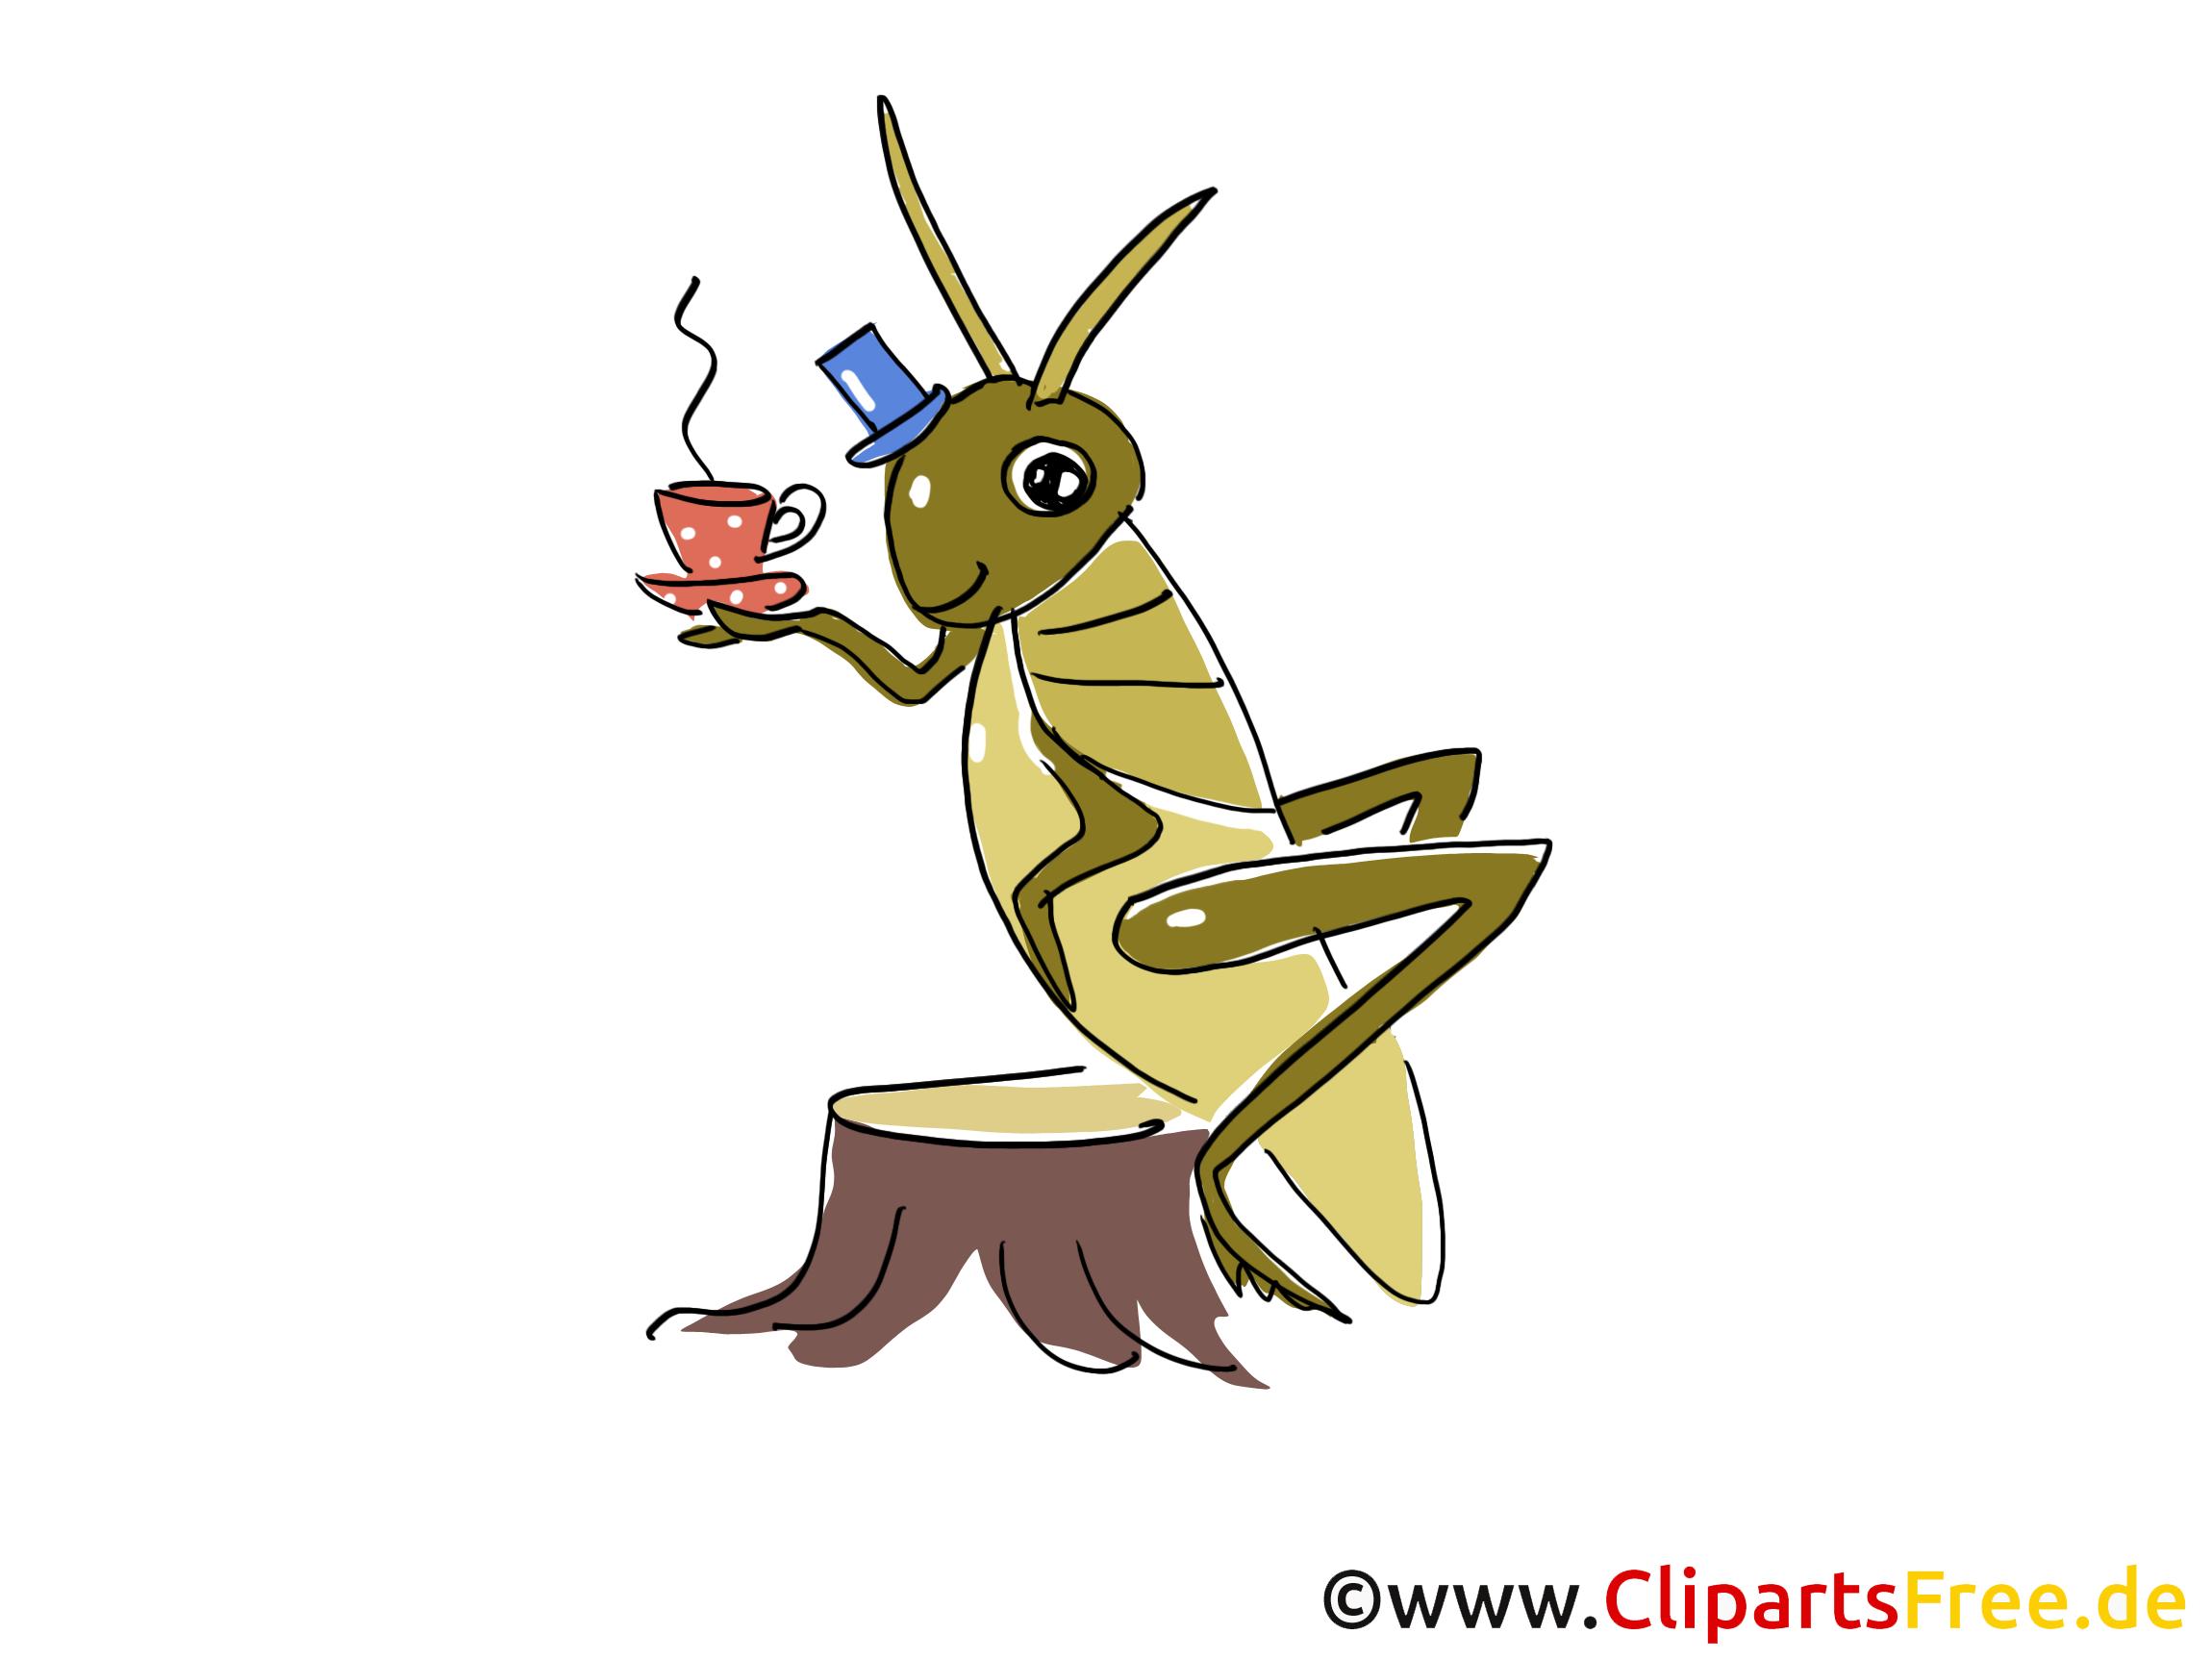 Tee trinken clipart graphic library stock Tee Trinken Clipart (11+) graphic library stock